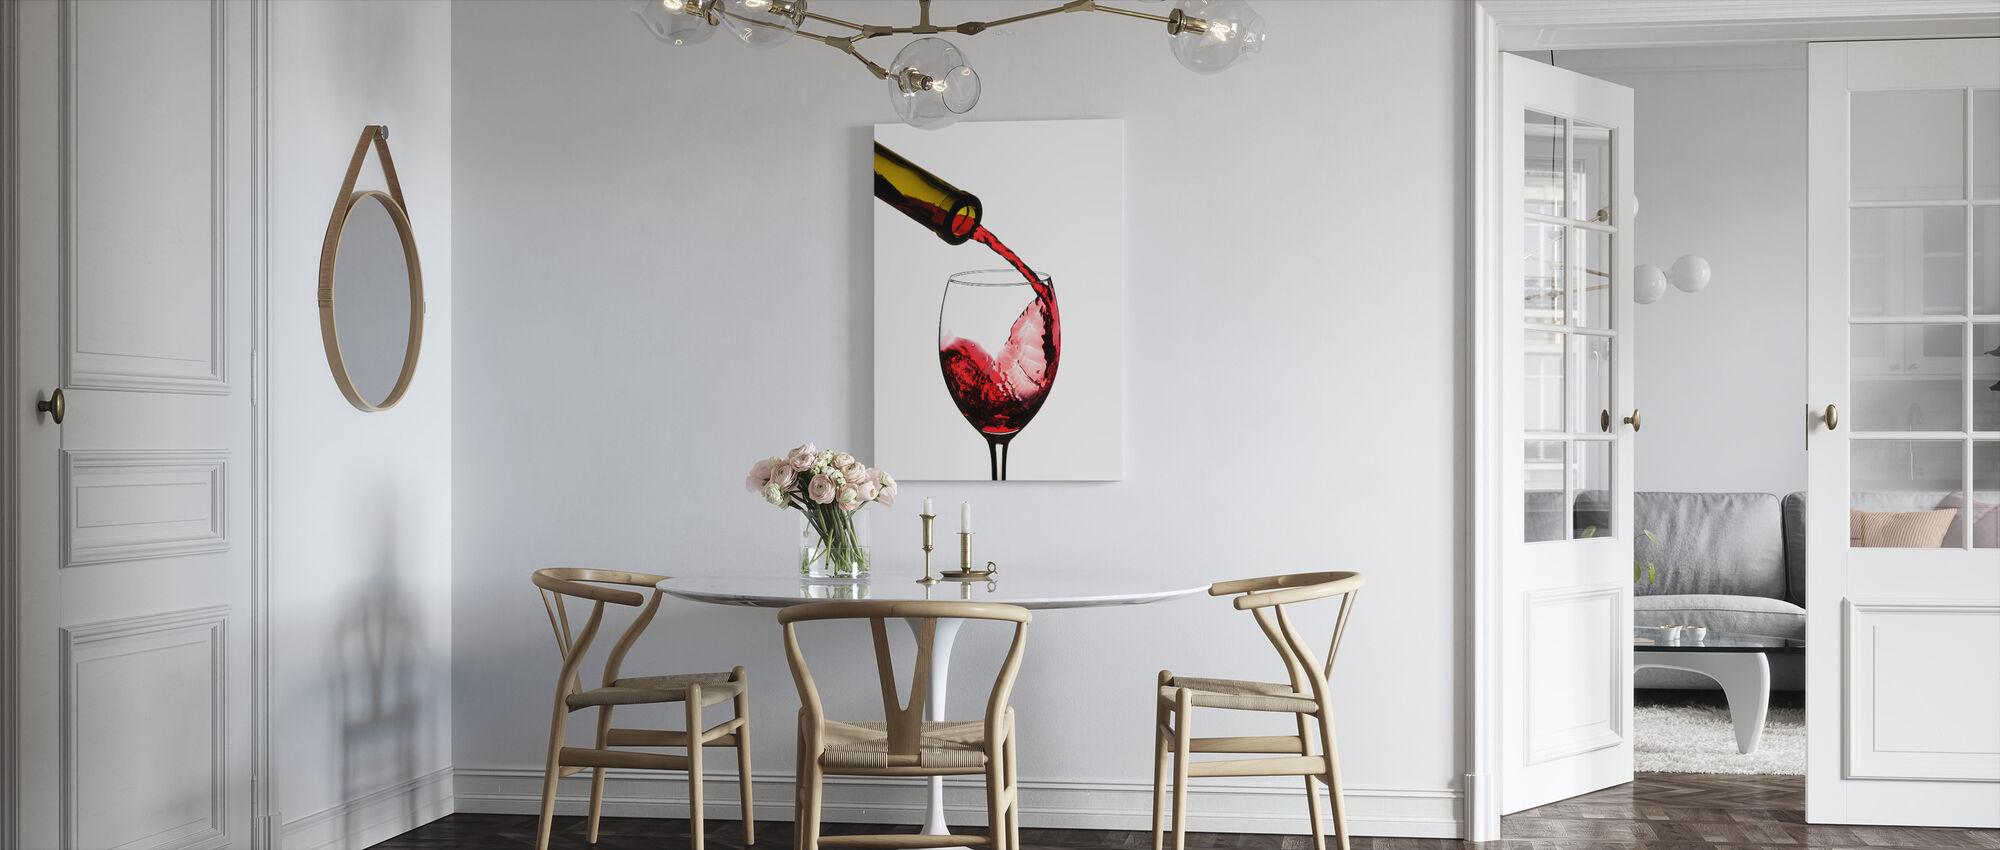 Rotwein Pour - Leinwandbild - Küchen